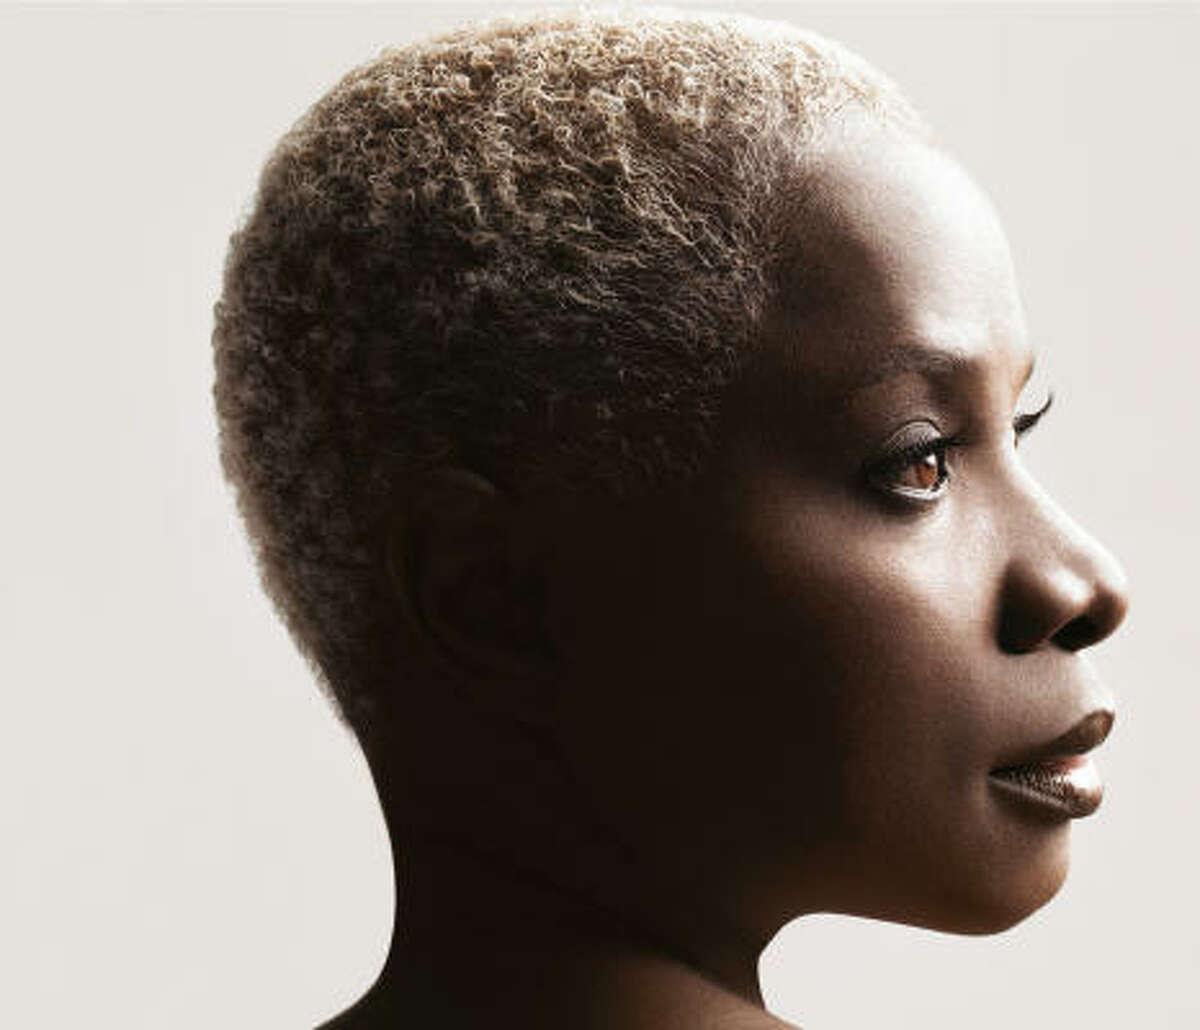 Angélique Kidjo incorporates gospel, jazz and Latin and Caribbean influences into her sound.